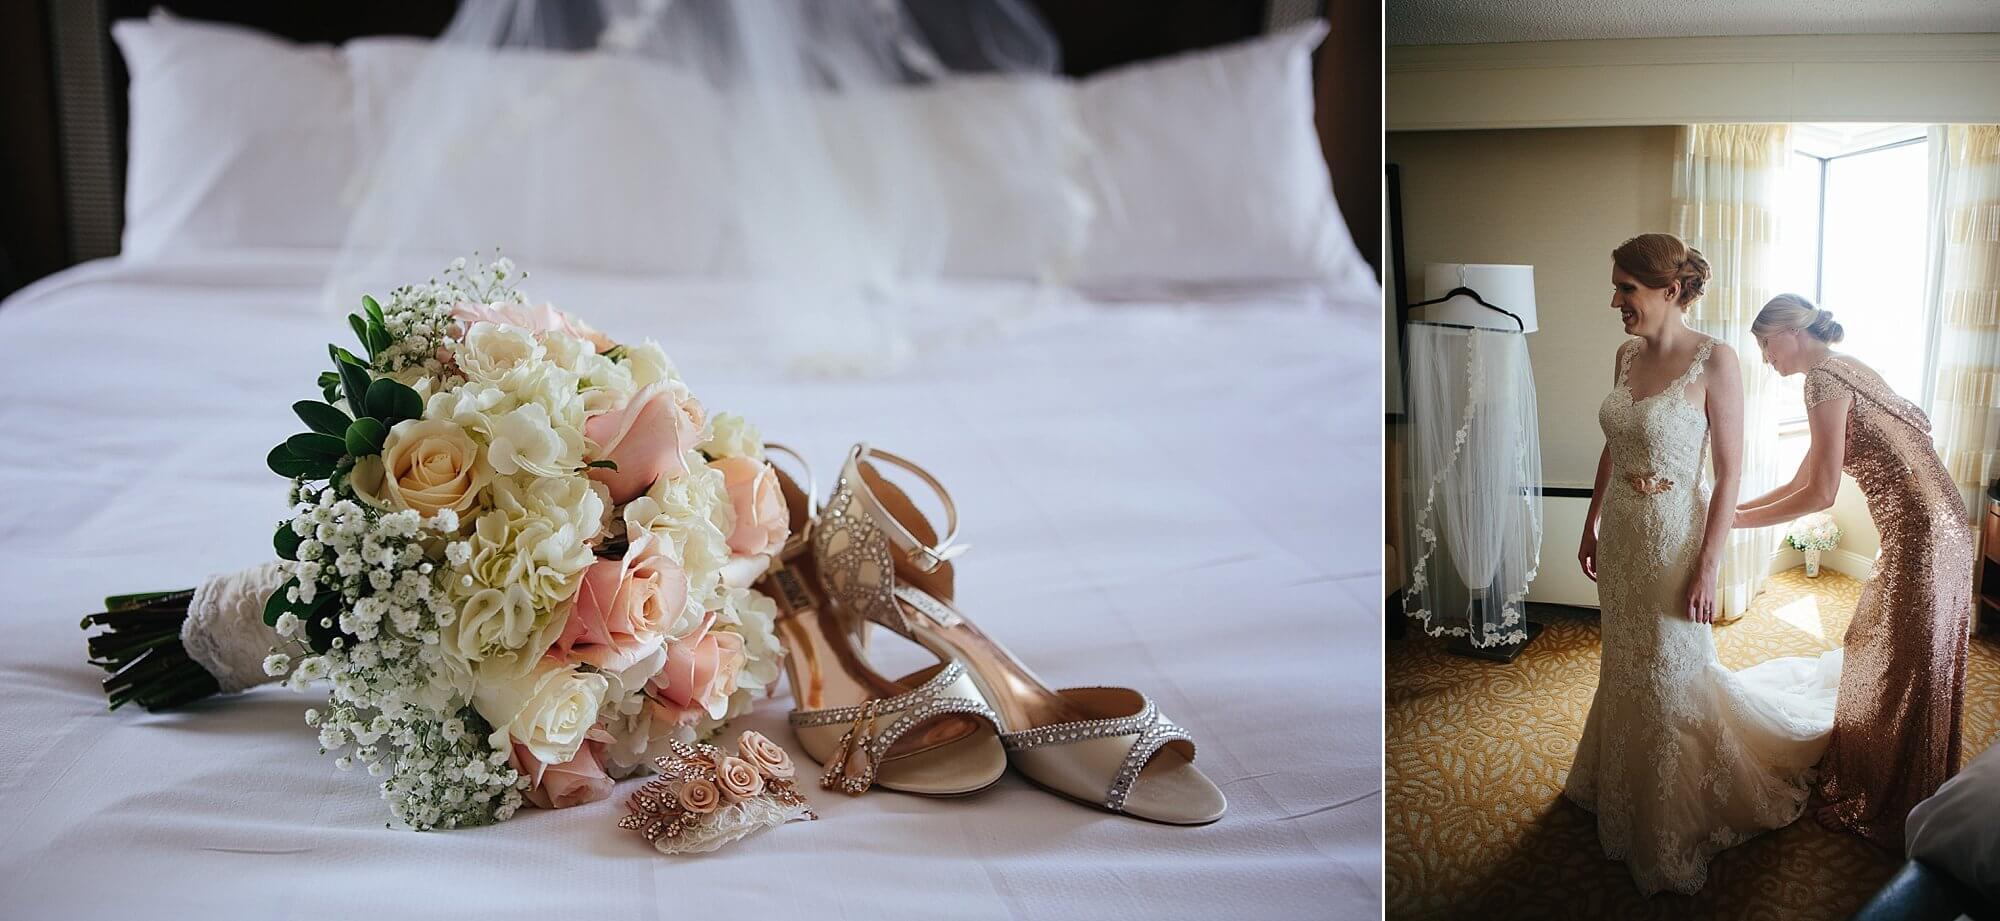 Blush, neutral wedding tones  |  Dana Osborne Design Wedding Invitations